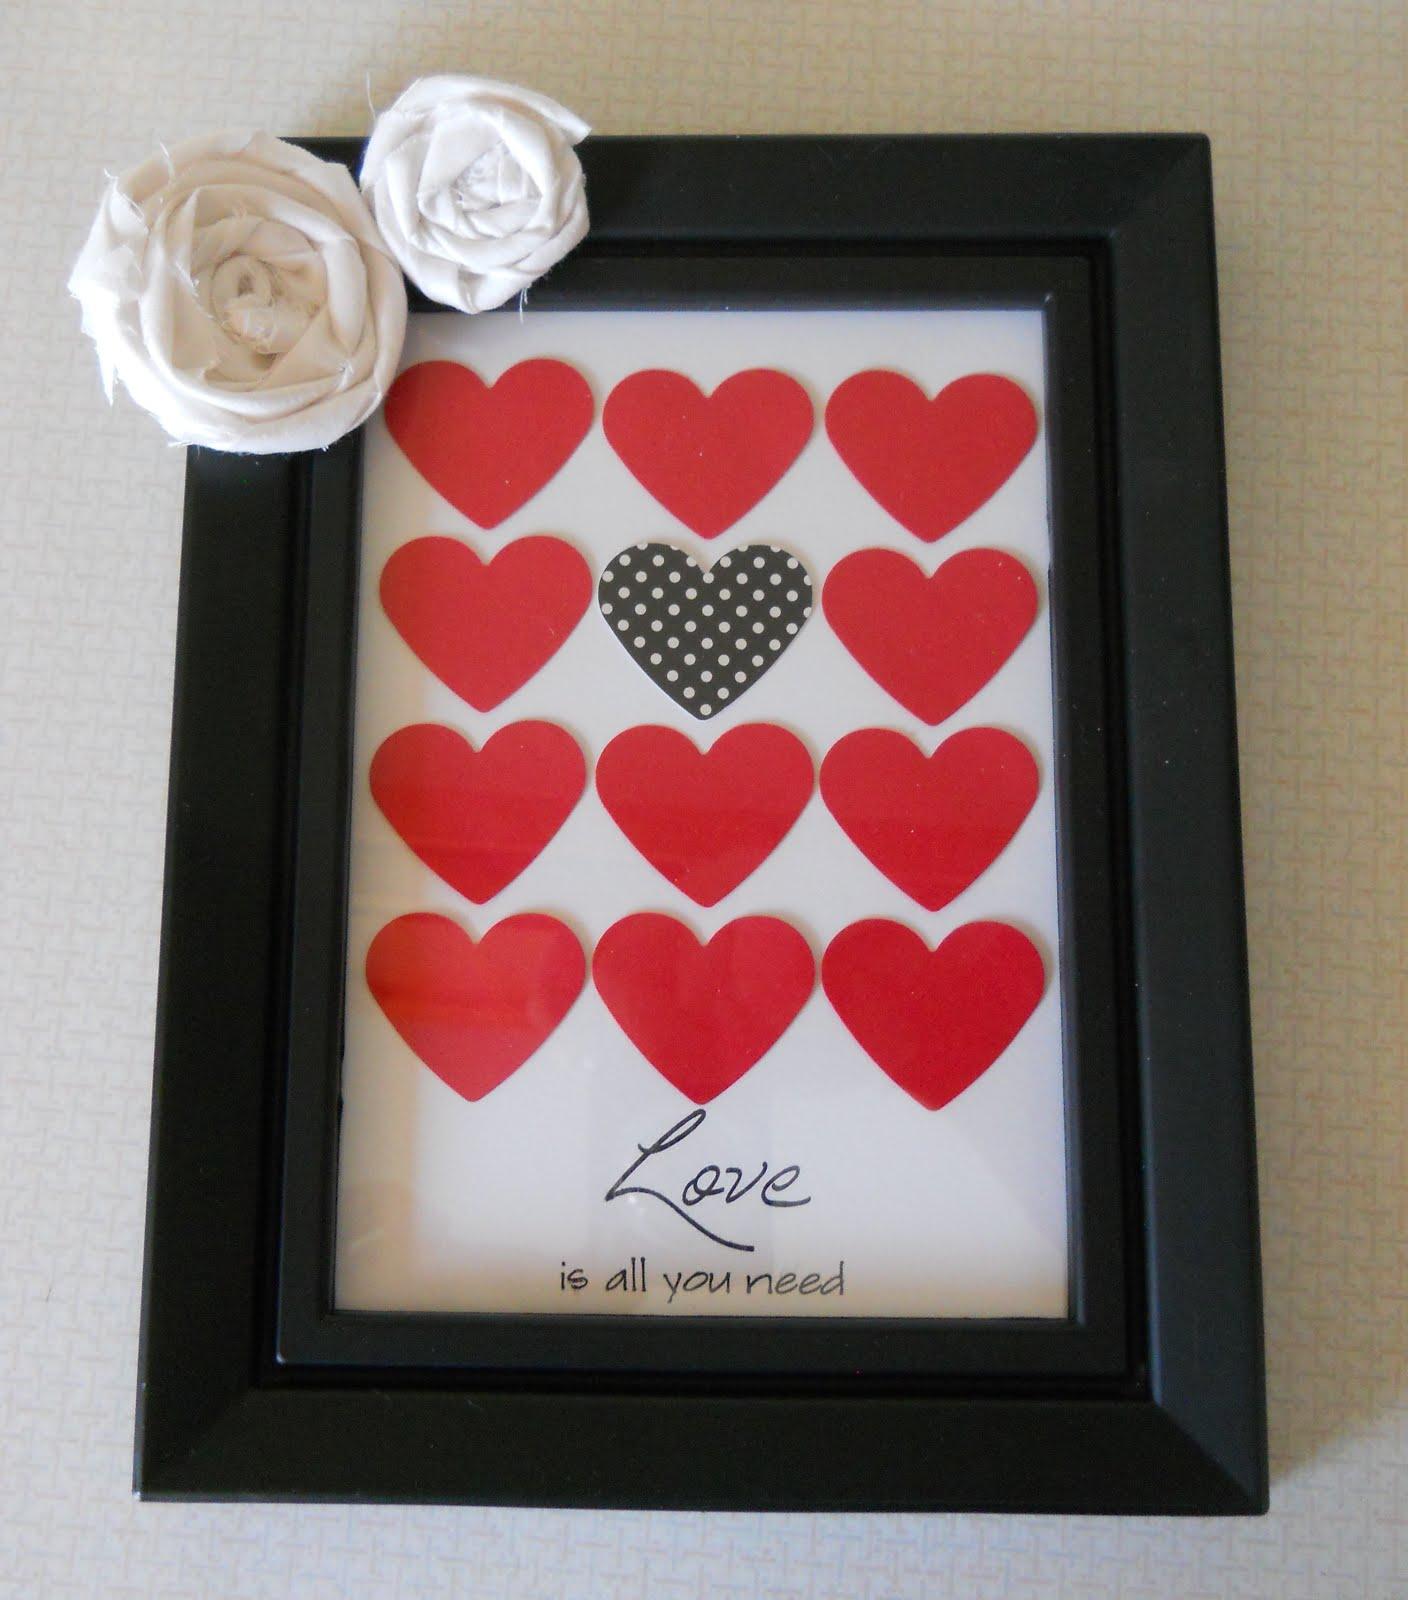 Dandelions and Dust Bunnies: Framed Heart Specimen Art